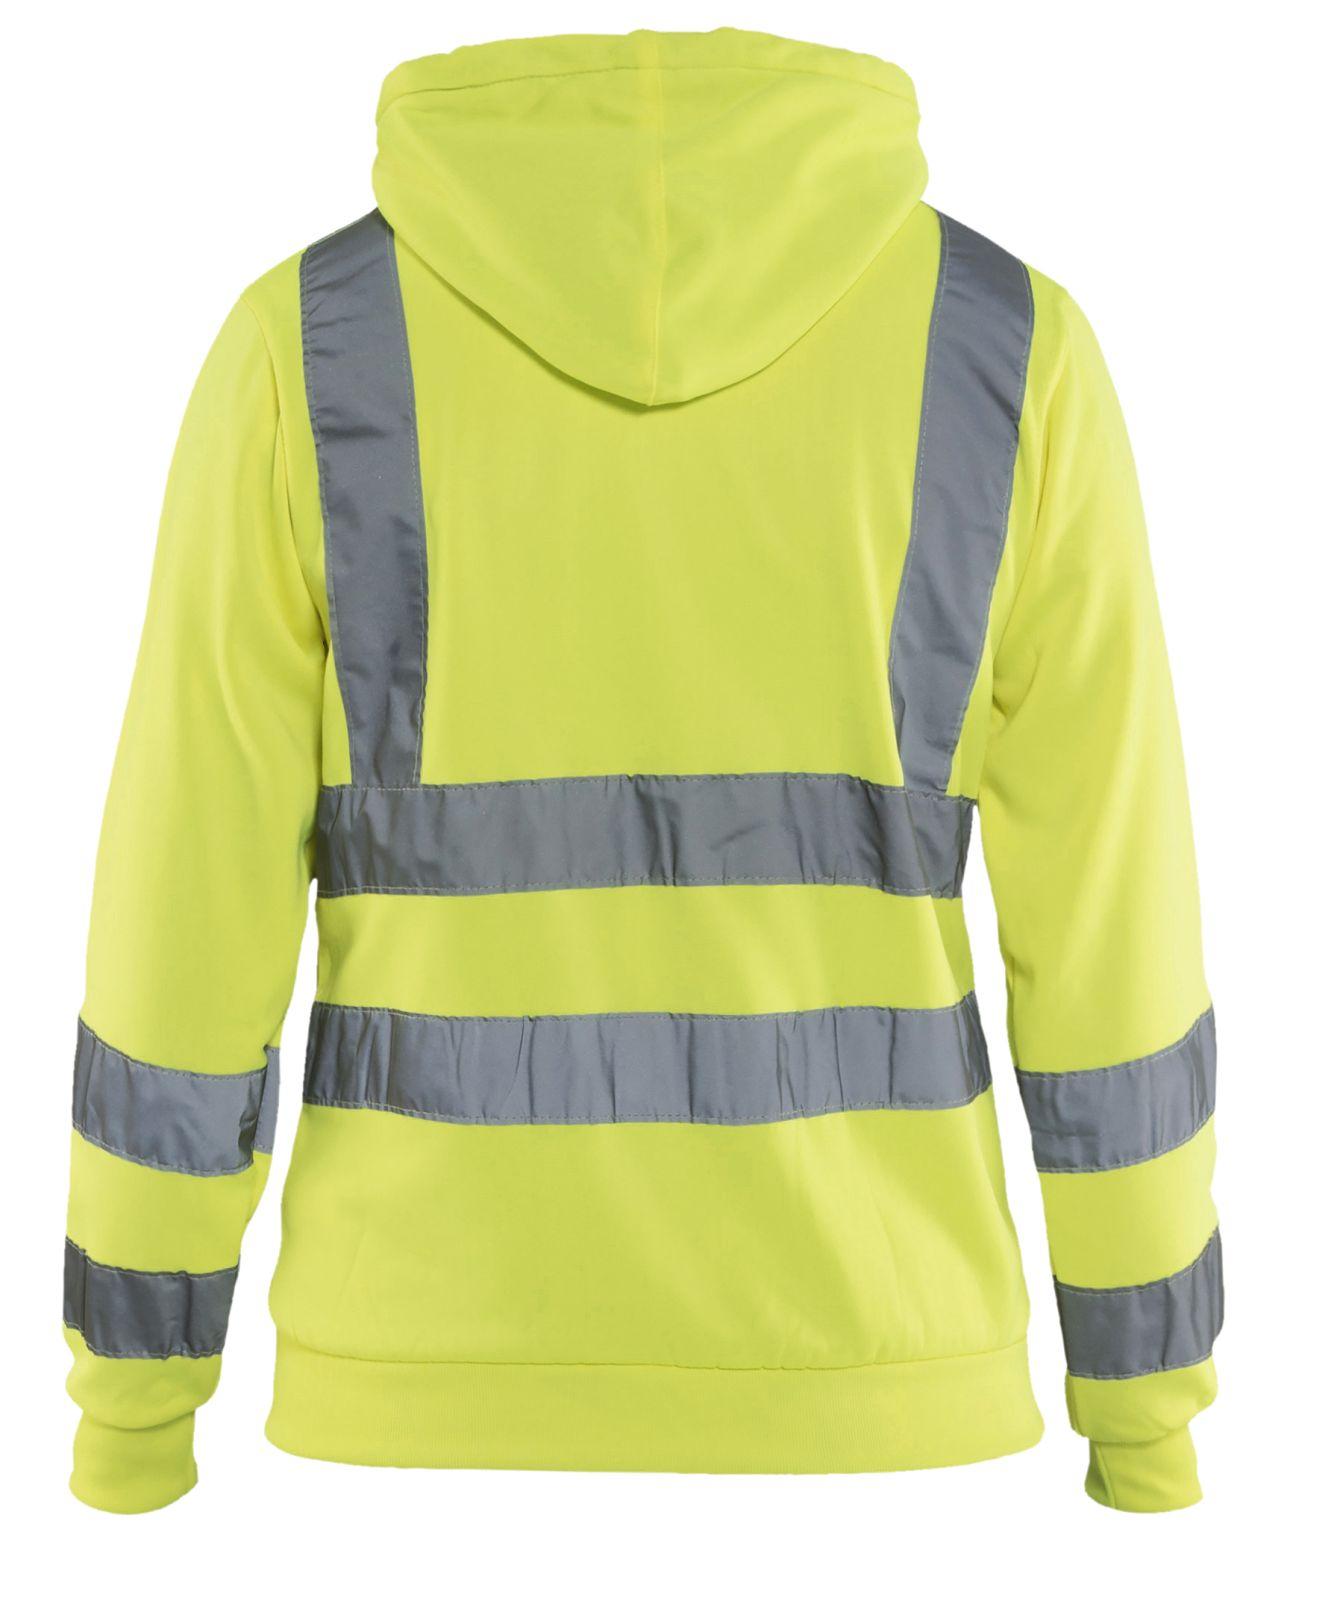 Blaklader Dames hooded sweatvesten 33471974 High Vis geel(3300)